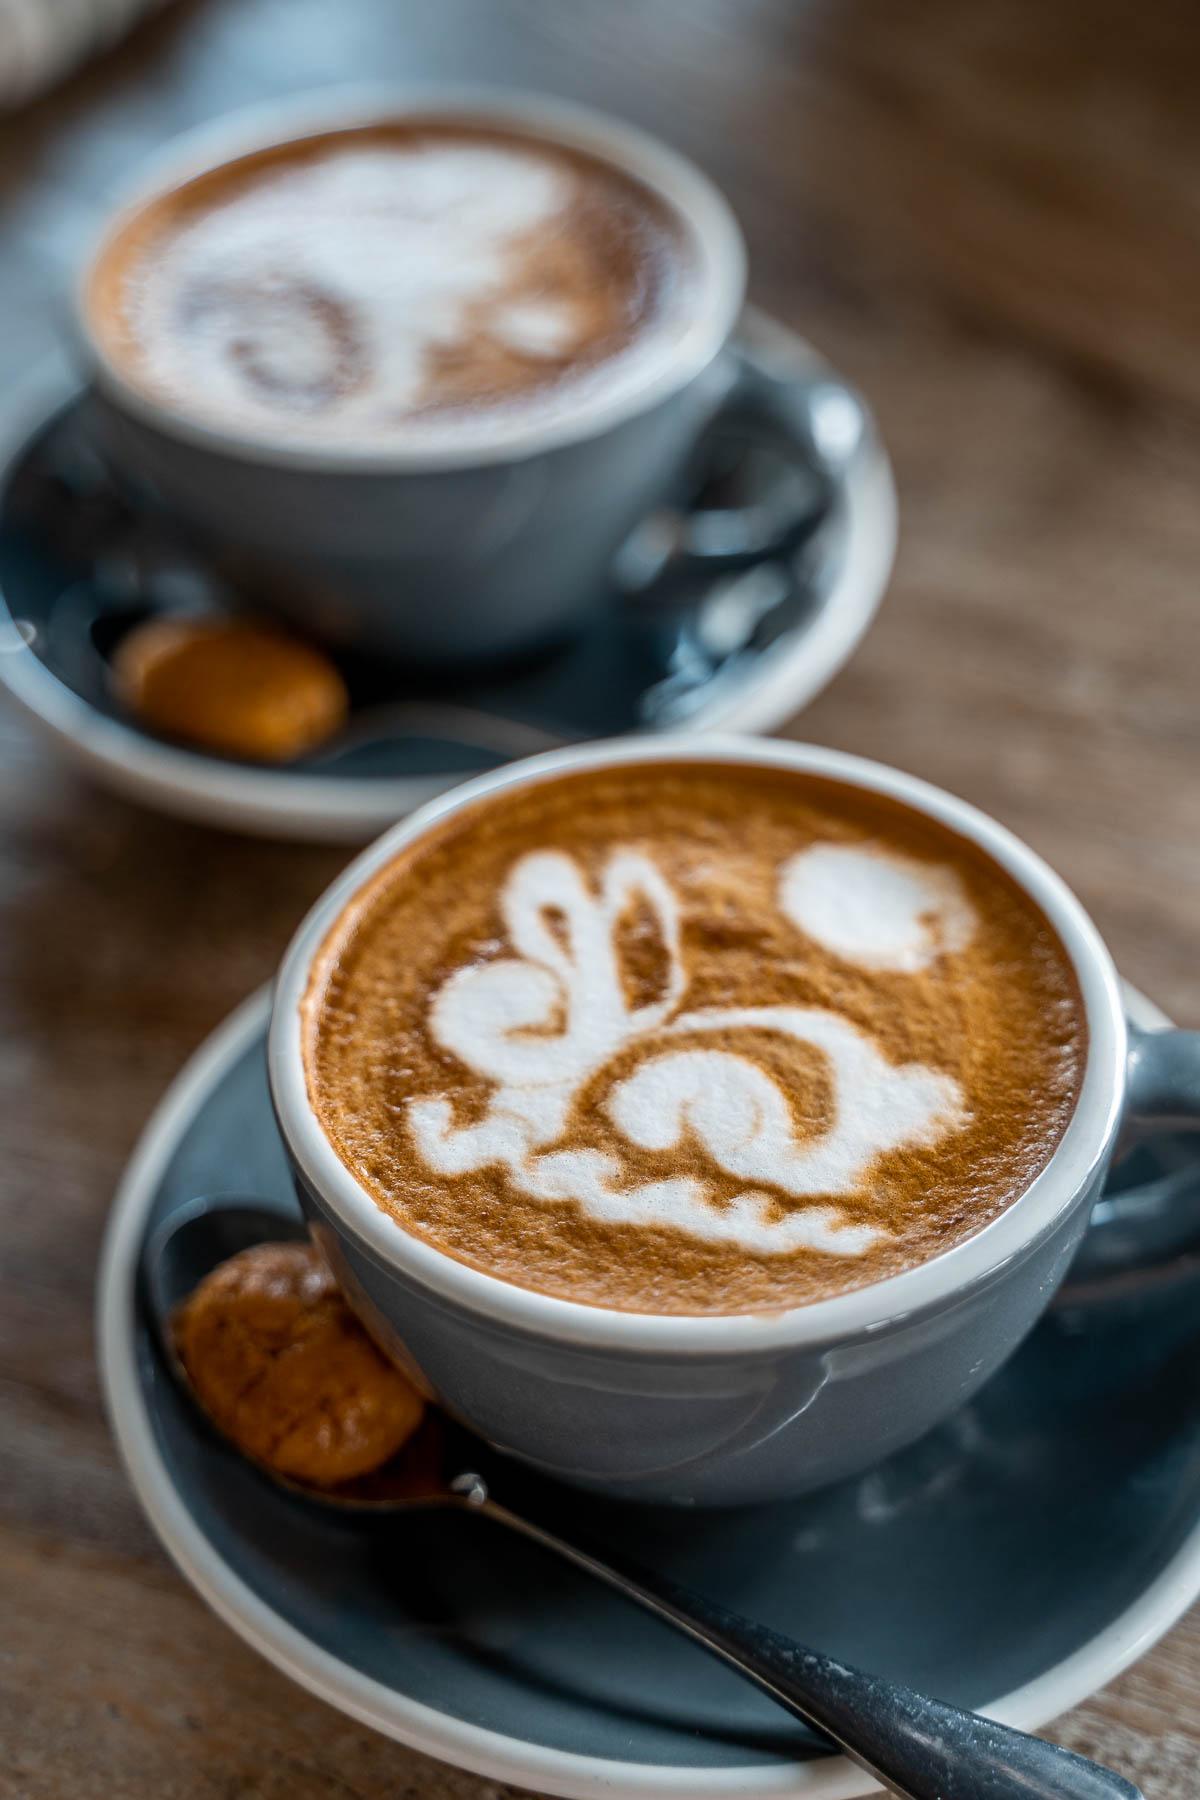 Cappuccino at the Avocado Factory Canggu, Bali